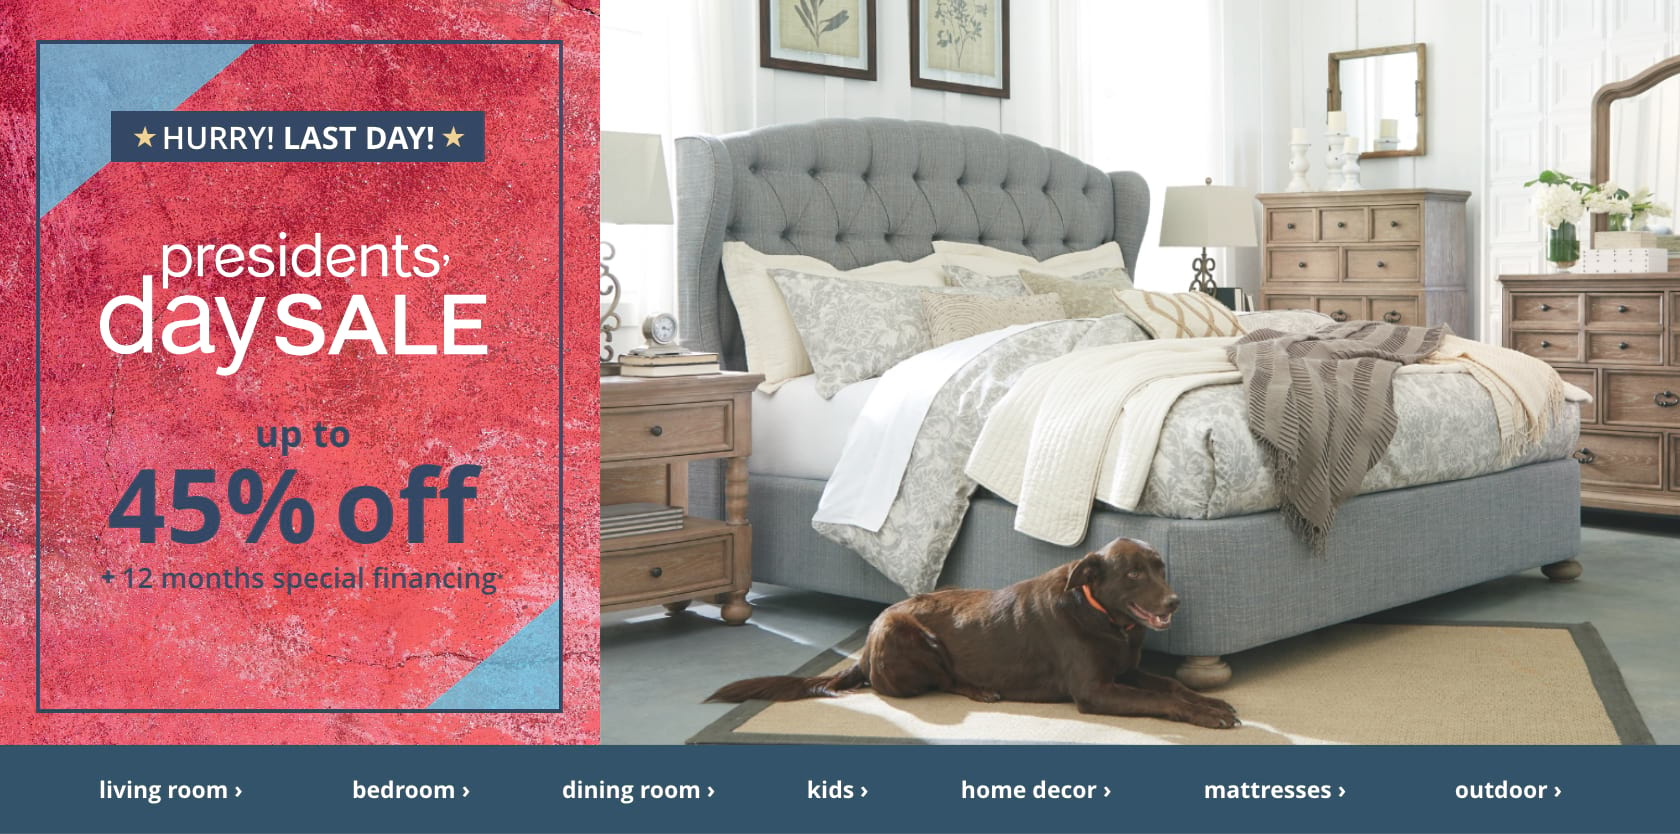 ashley furniture homestore home furniture decor. Black Bedroom Furniture Sets. Home Design Ideas